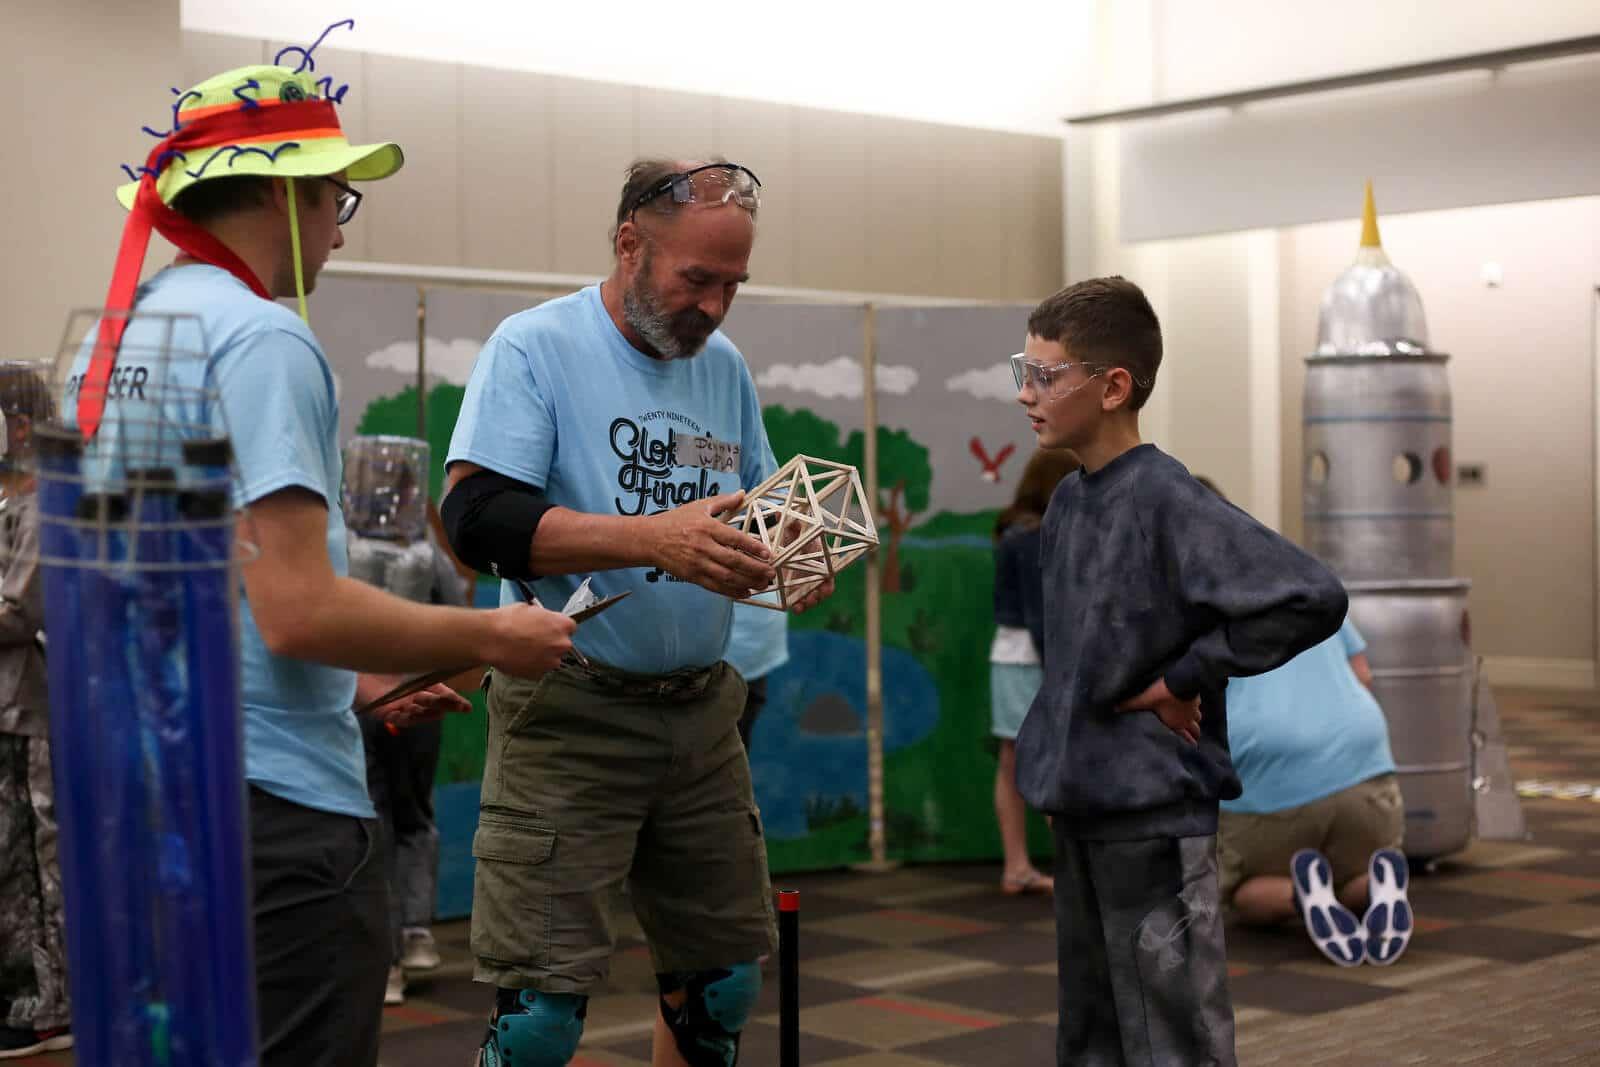 Student talking to a Destination Imagination tournament official